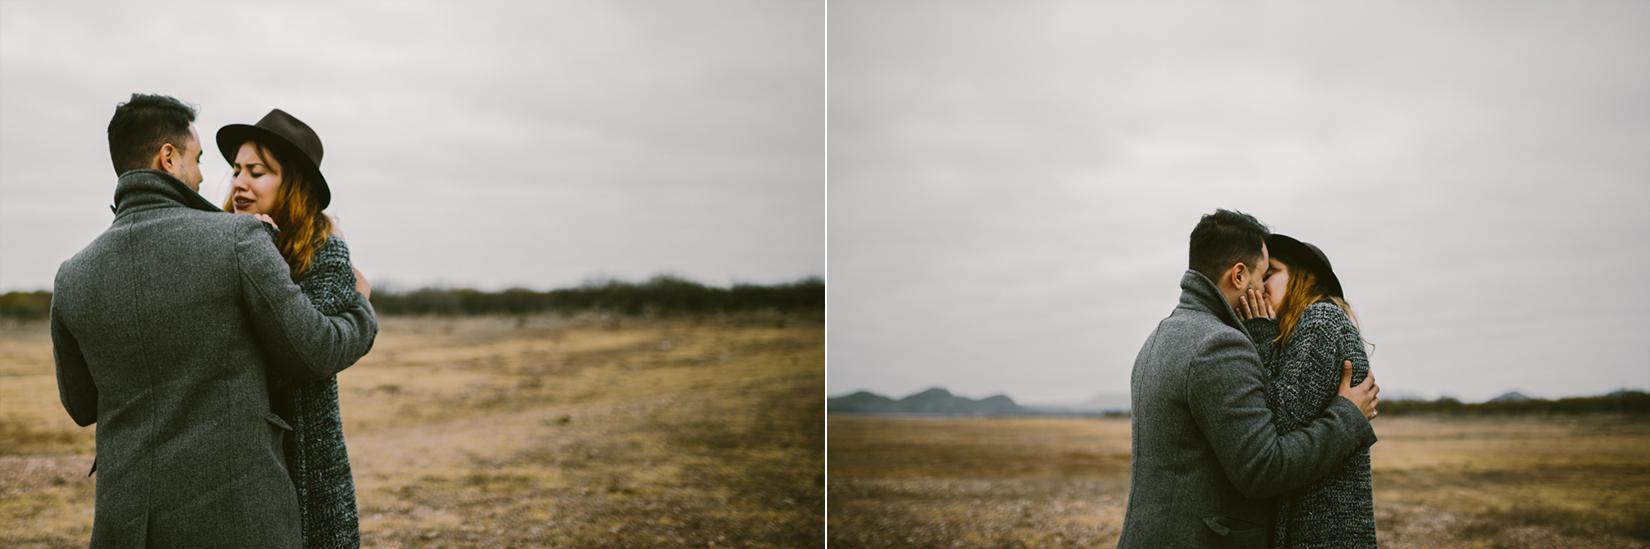 collage frida 6.jpg